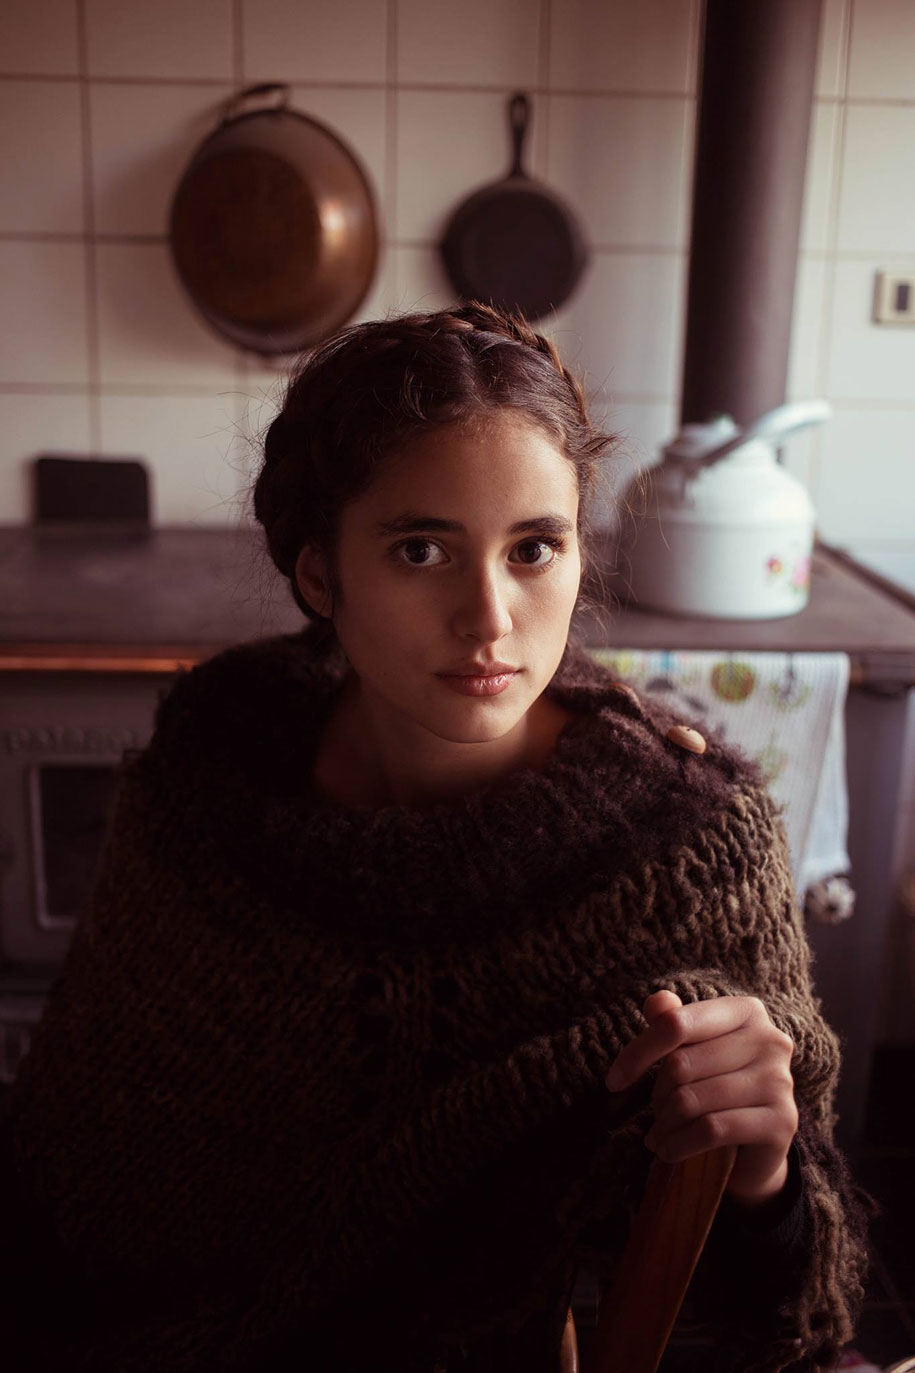 women-around-world-atlas-beauty-mihaela-noroc-29